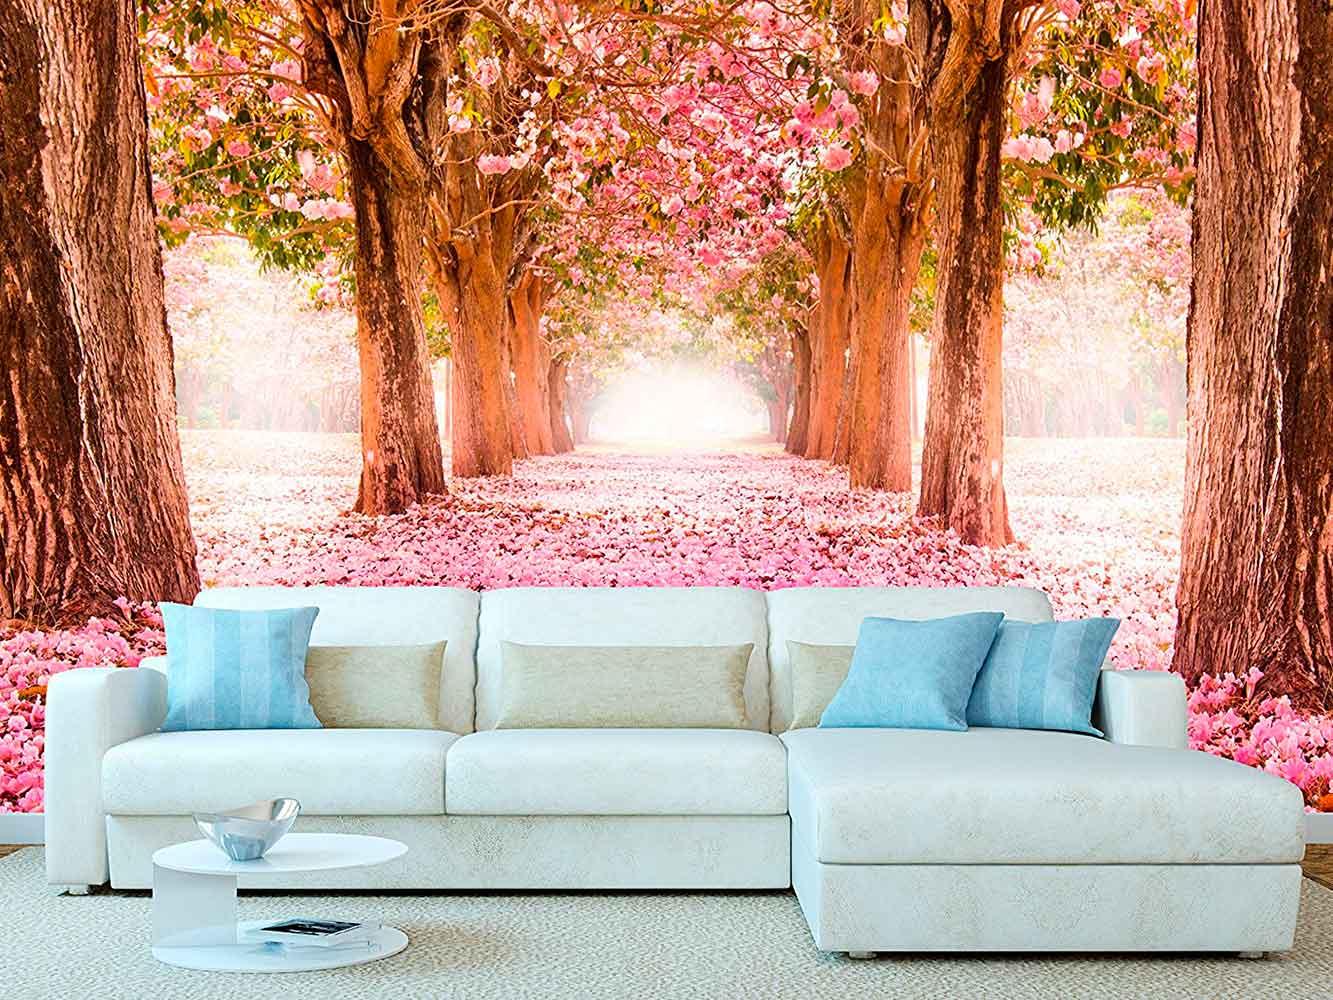 fotomural-vinilo-paisaje-rosas